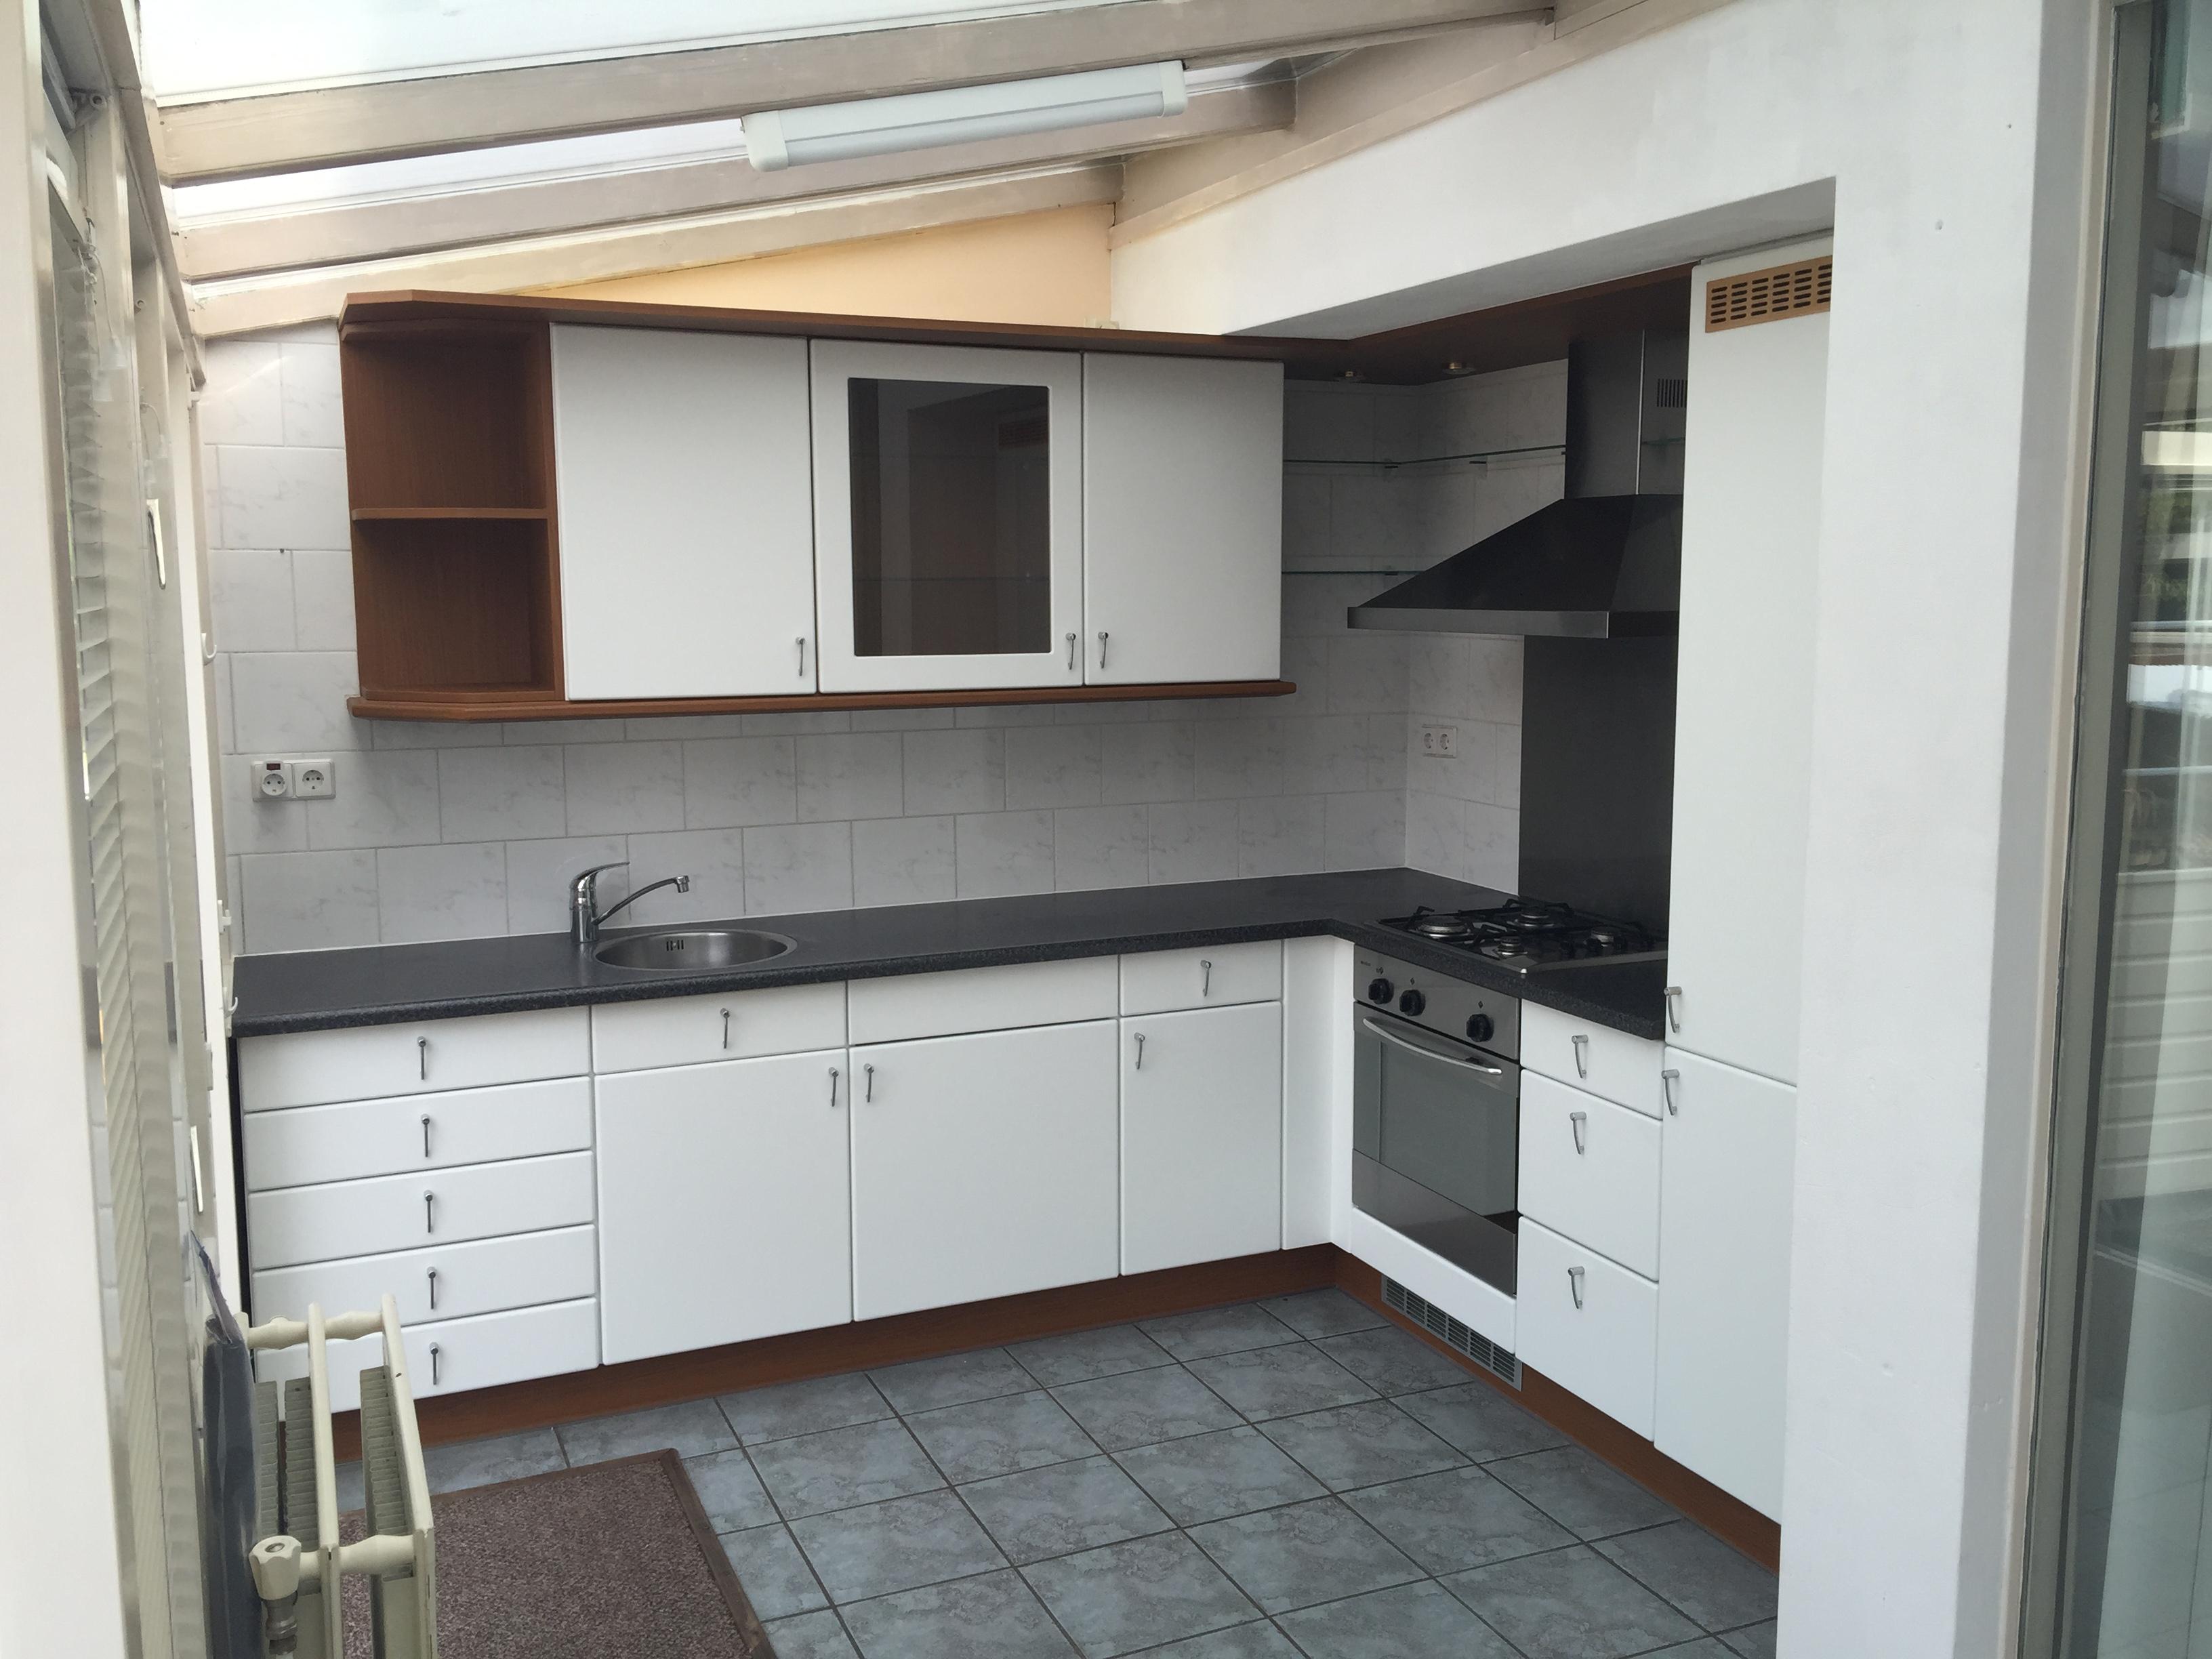 Keuken edam - Oude foto keuken ...